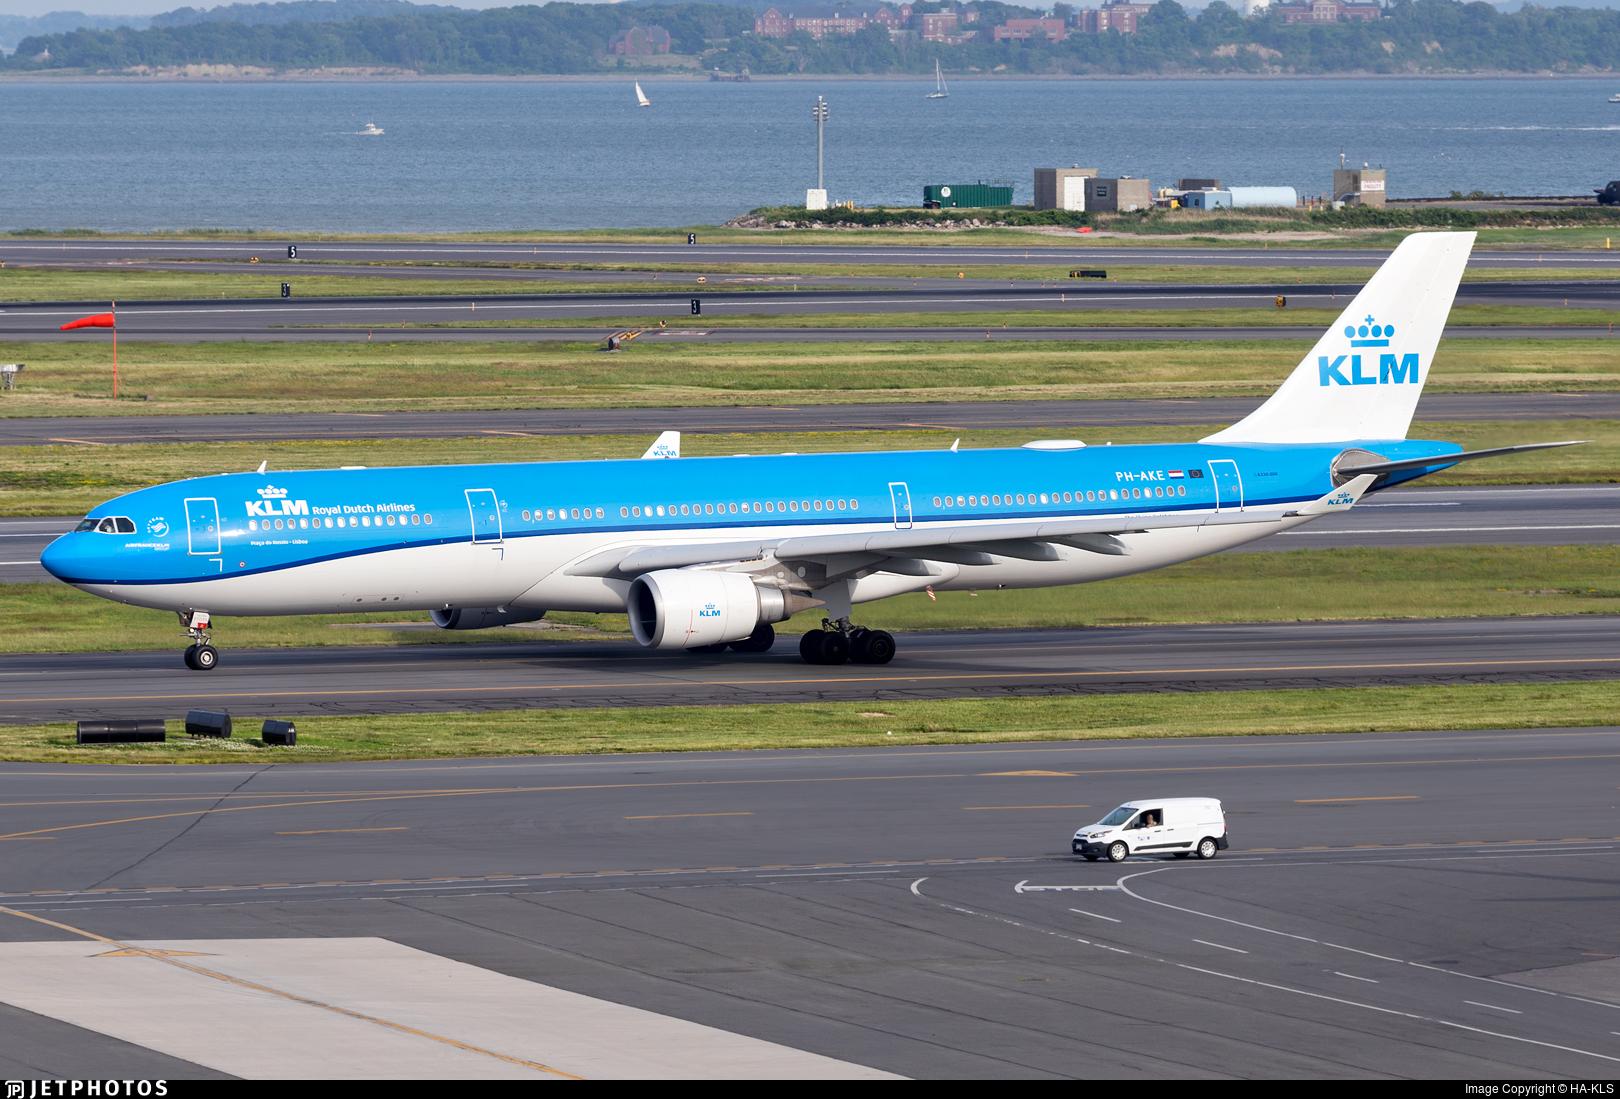 PH-AKE - Airbus A330-303 - KLM Royal Dutch Airlines